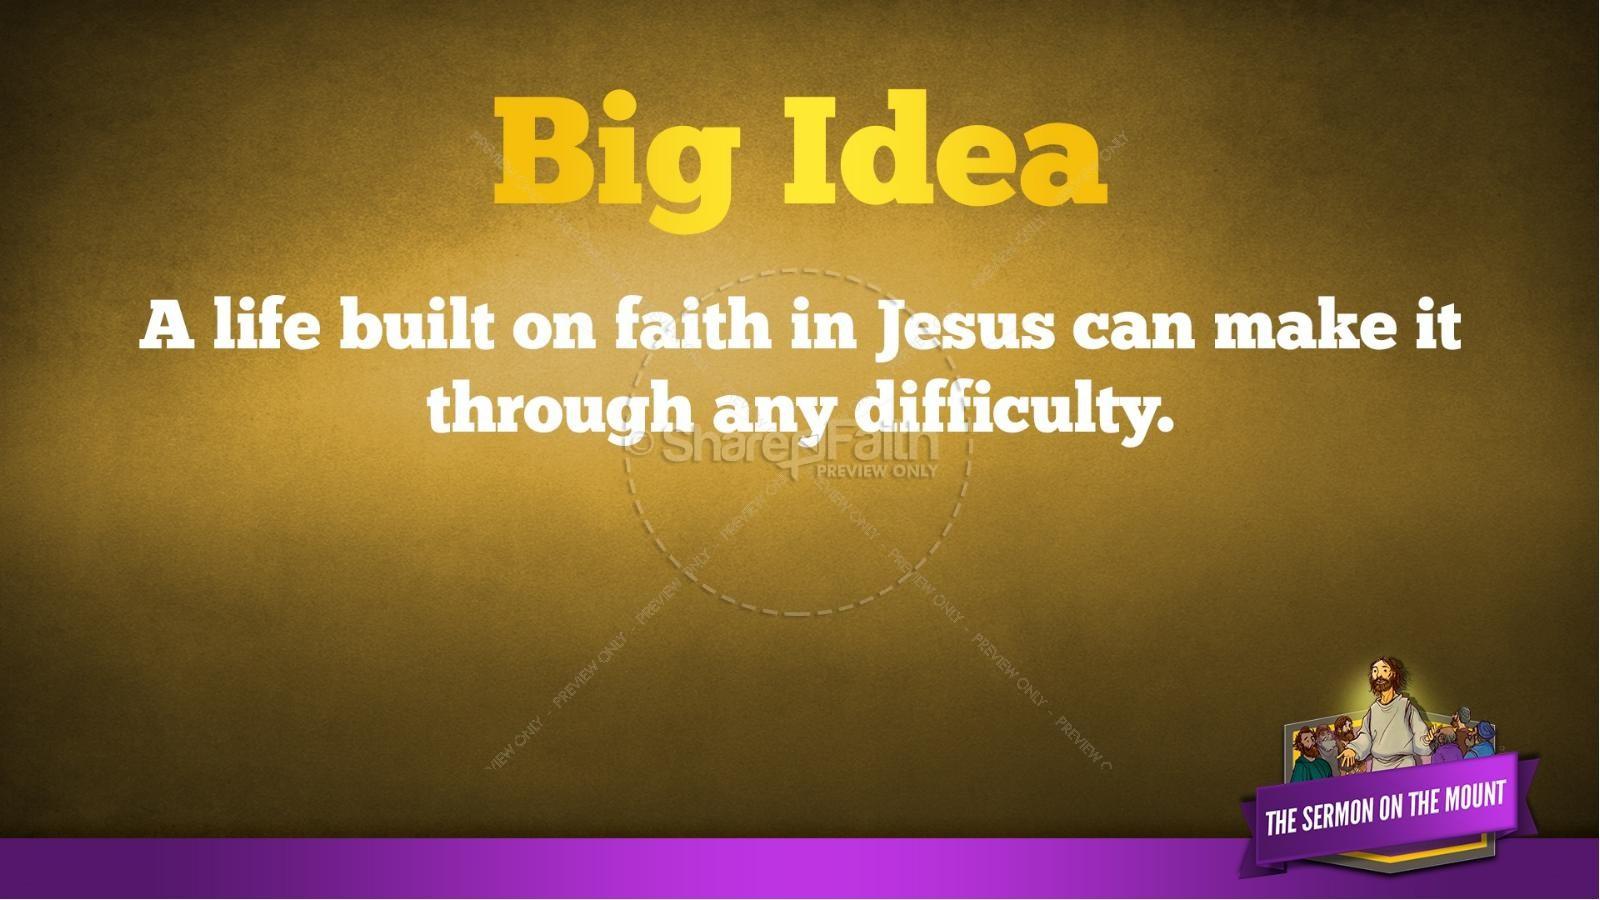 Sermon On the Mount (Beatitudes) Kids Bible Story | Kids Bible Stories